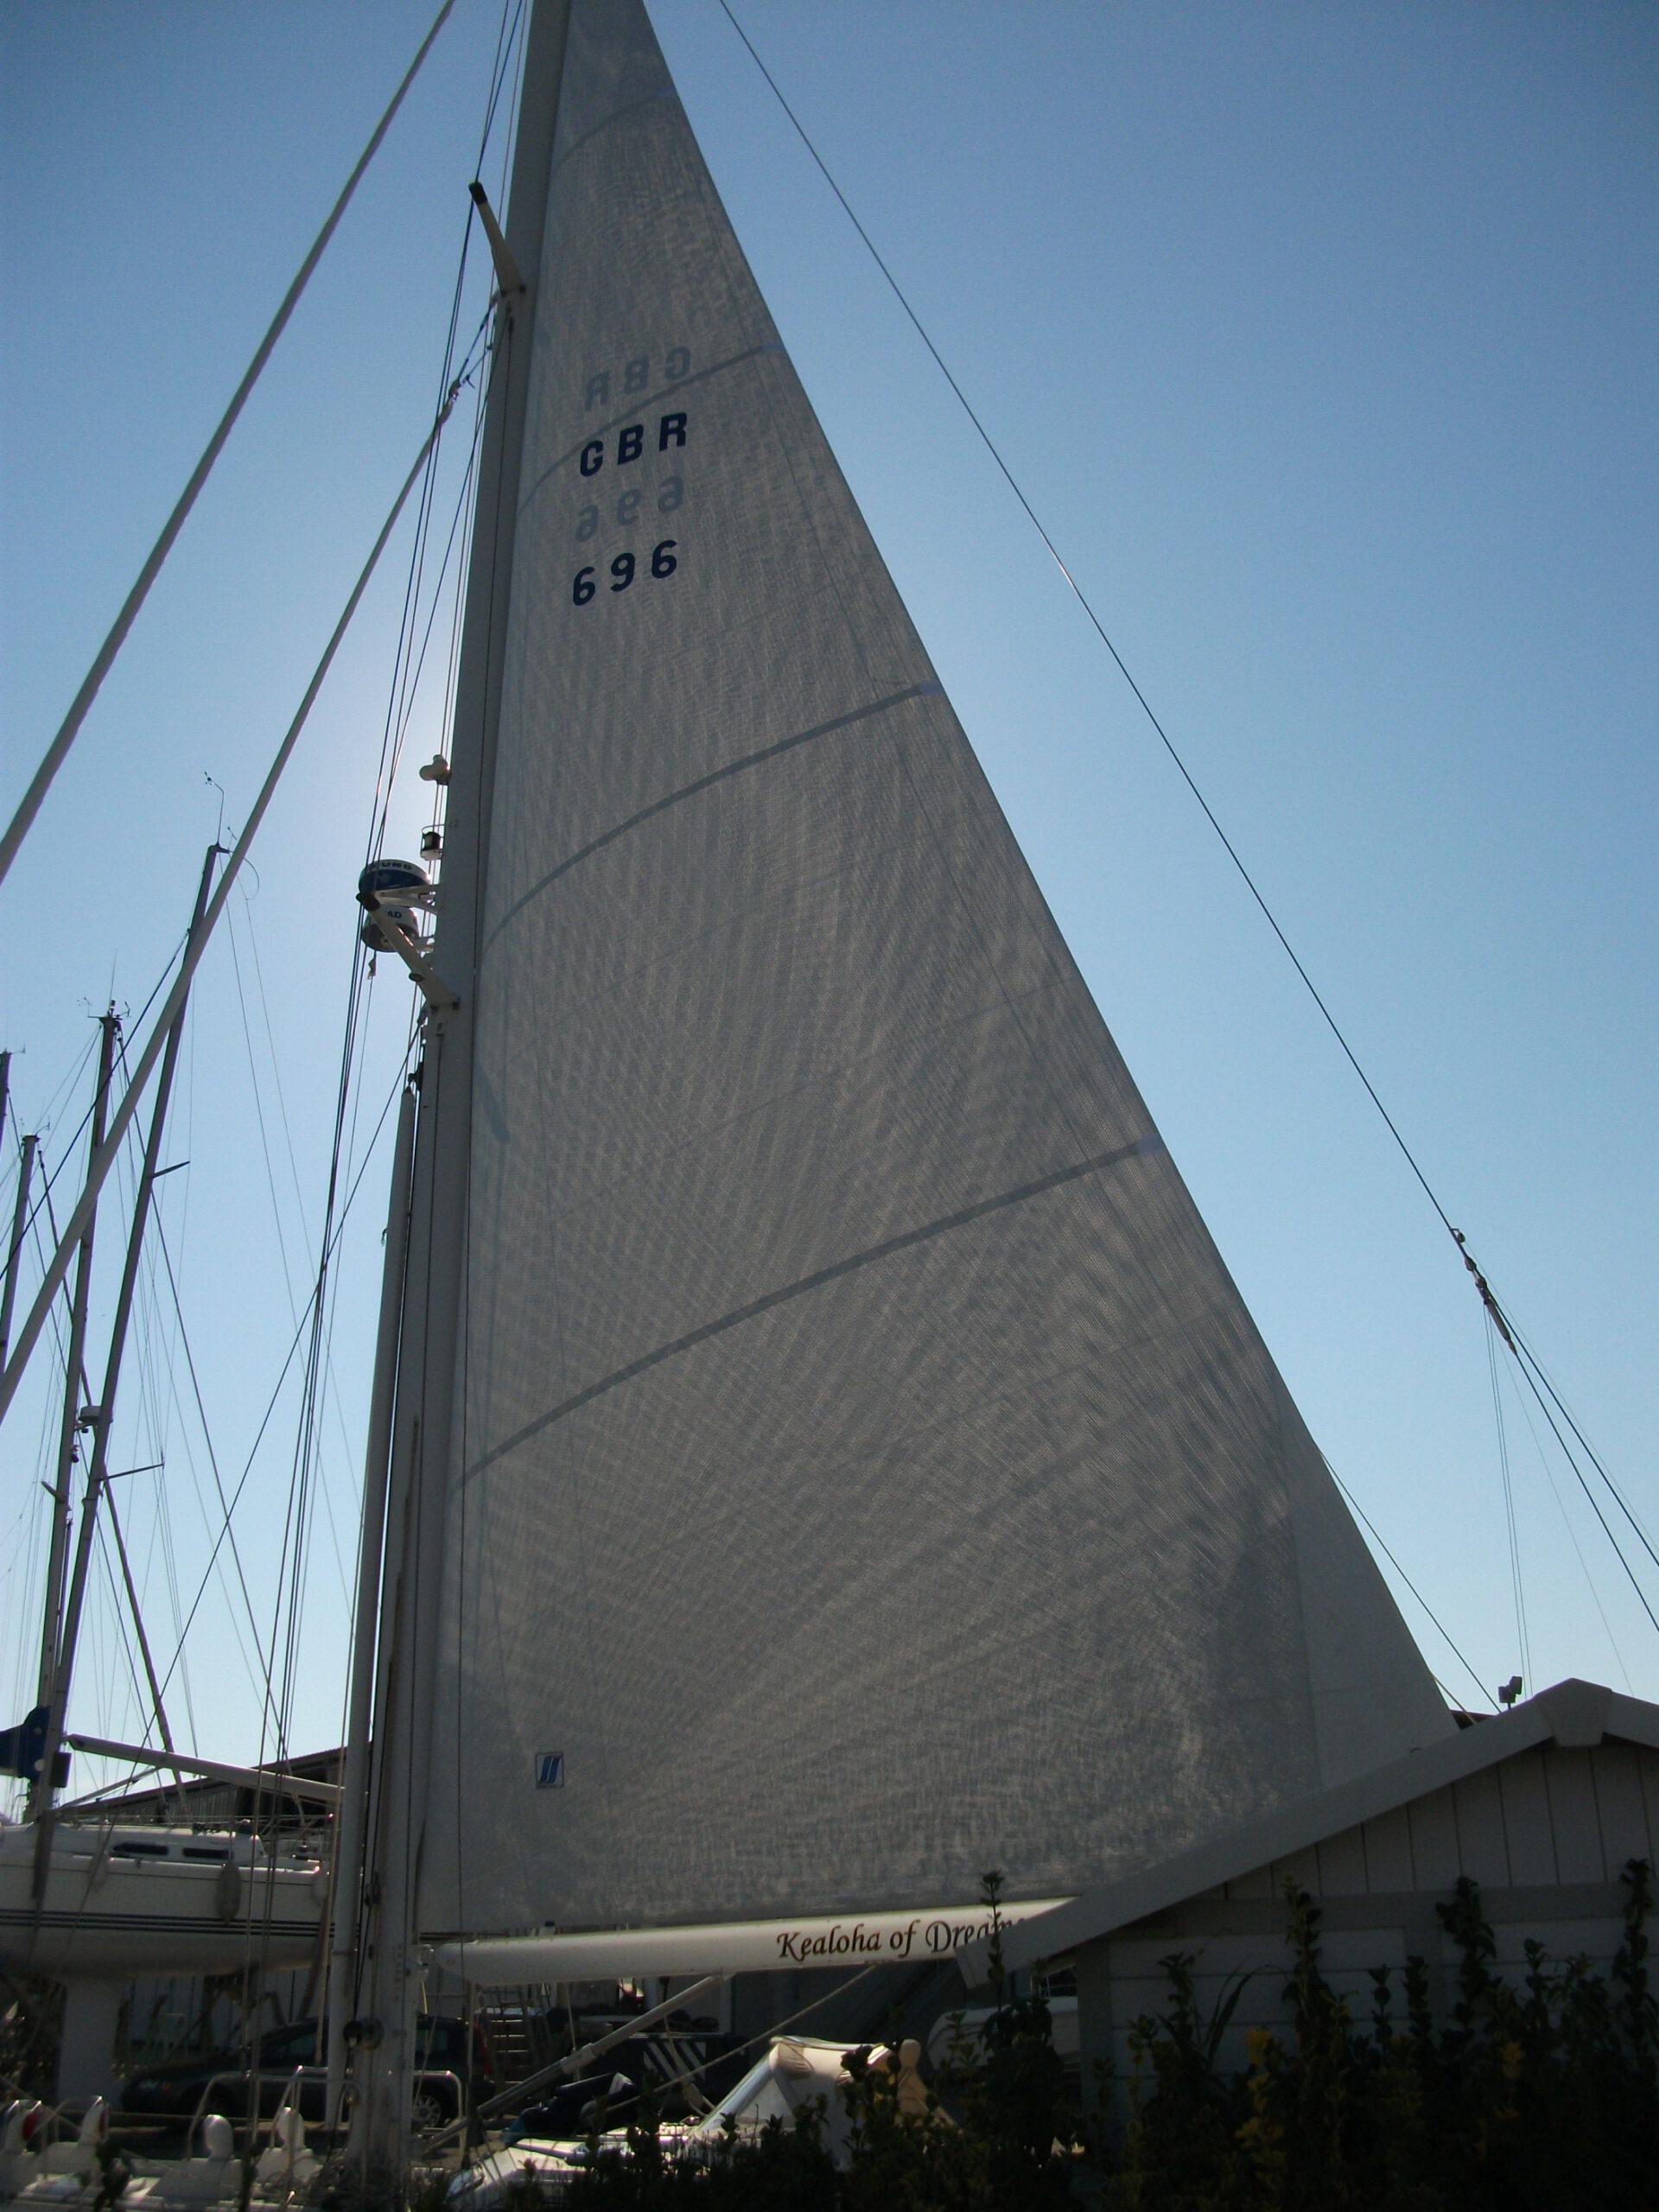 Trinchetta 018